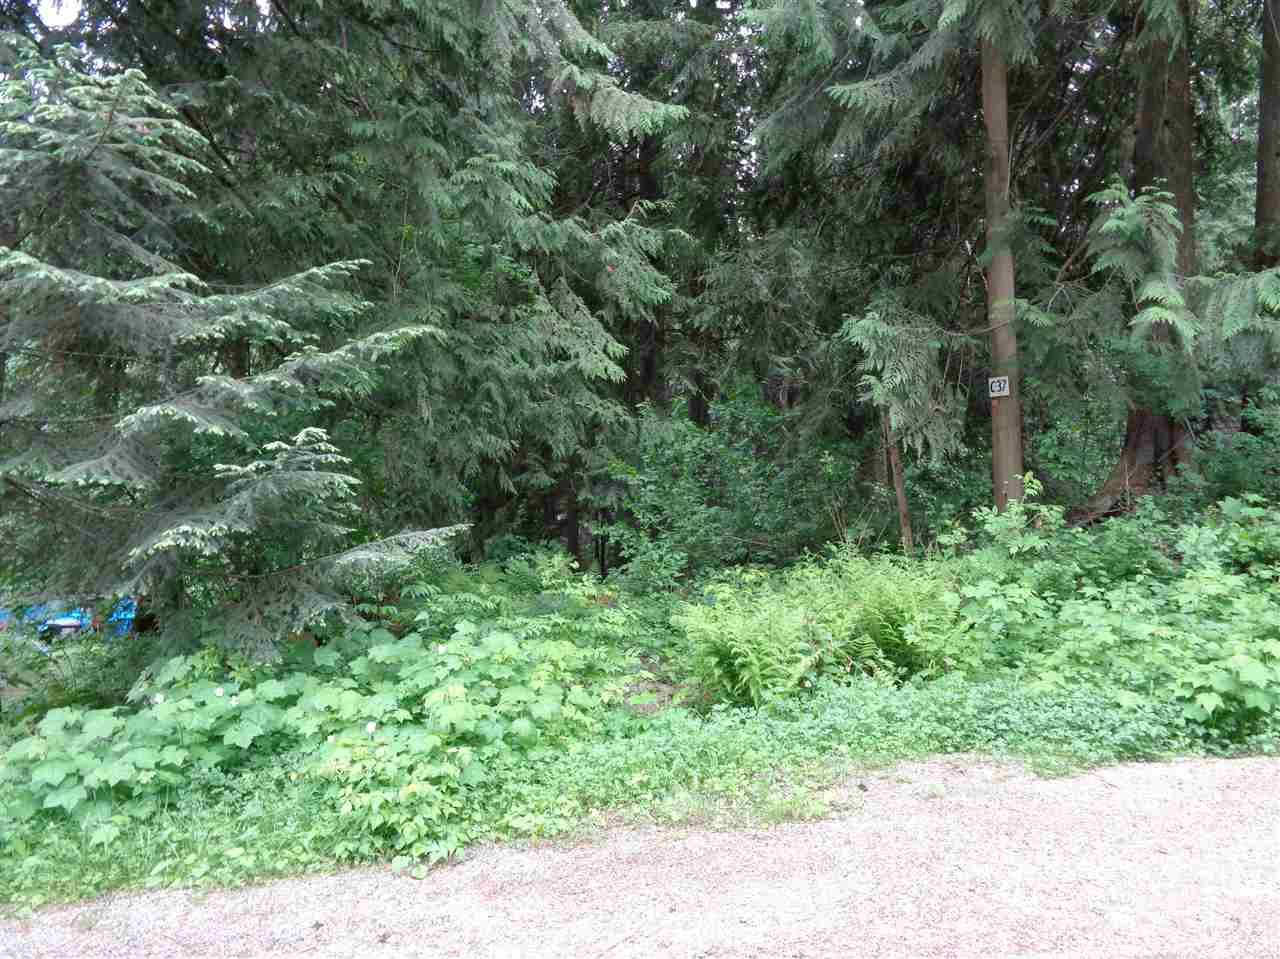 Main Photo: 71644 LEAF Lane in Hope: Hope Sunshine Valley Land for sale : MLS®# R2228648